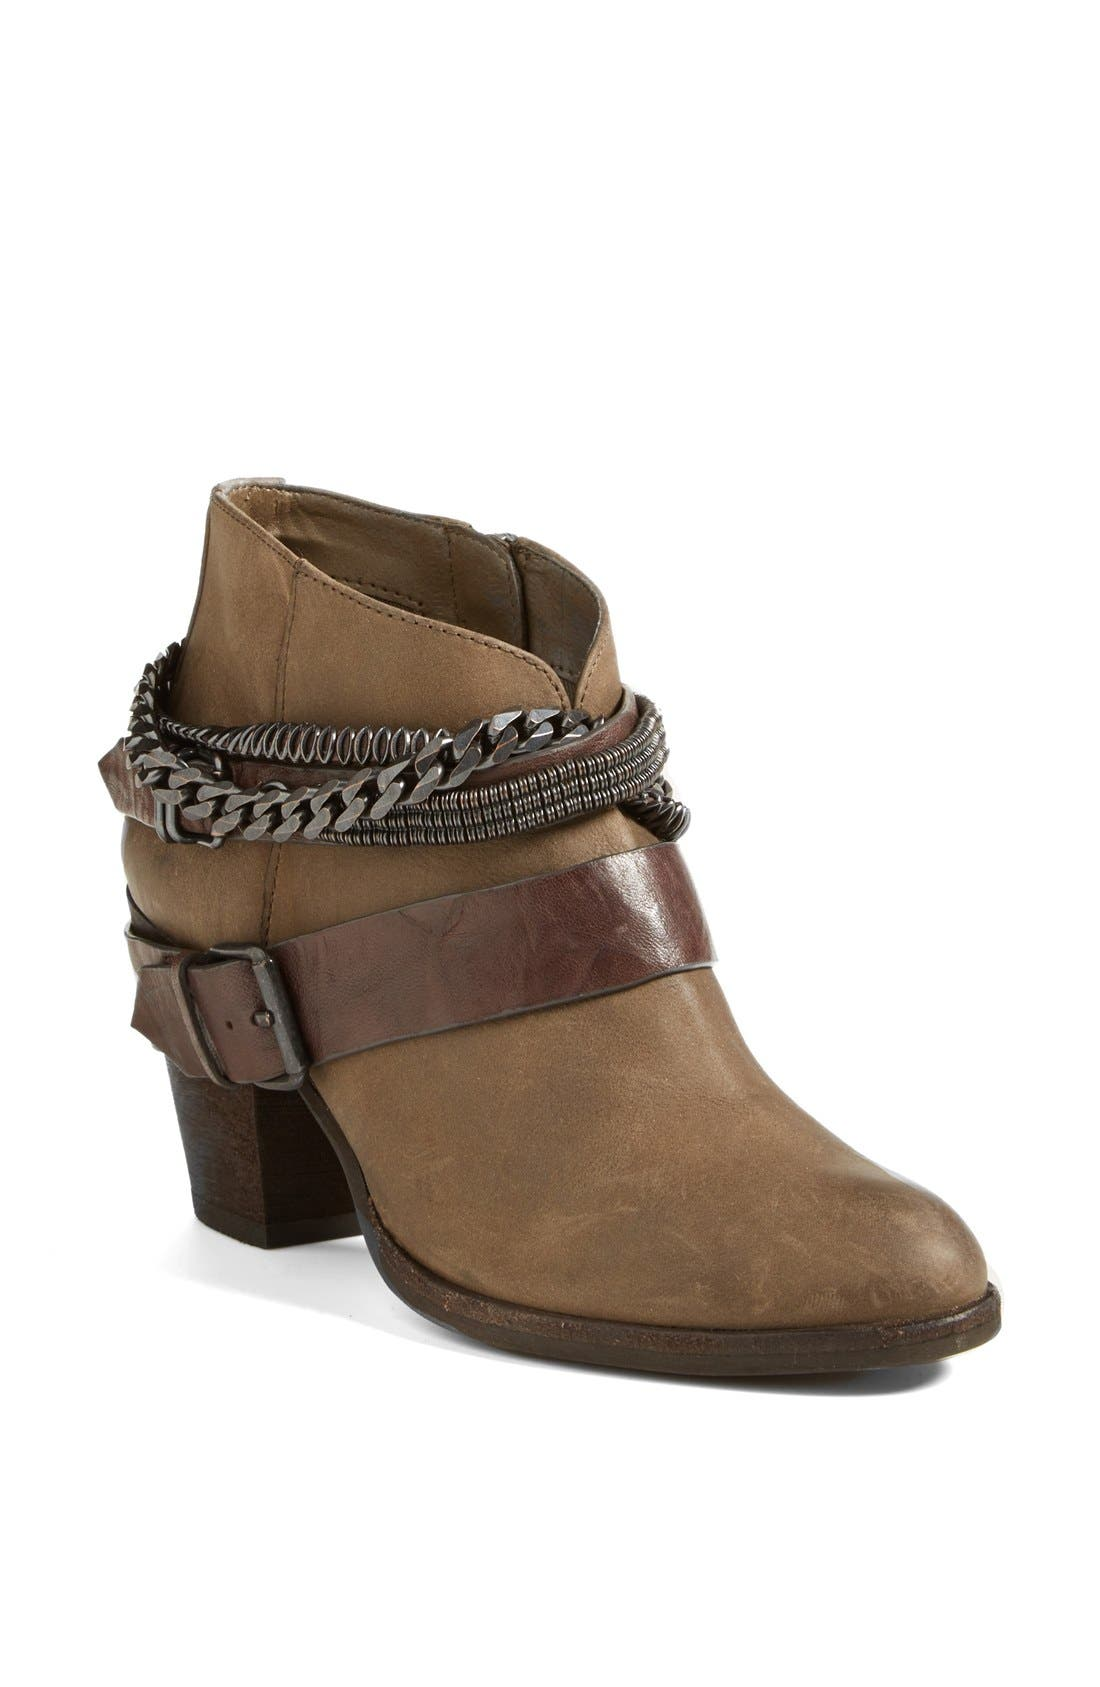 Alternate Image 1 Selected - Dolce Vita 'Yazmina' Leather Bootie (Women)